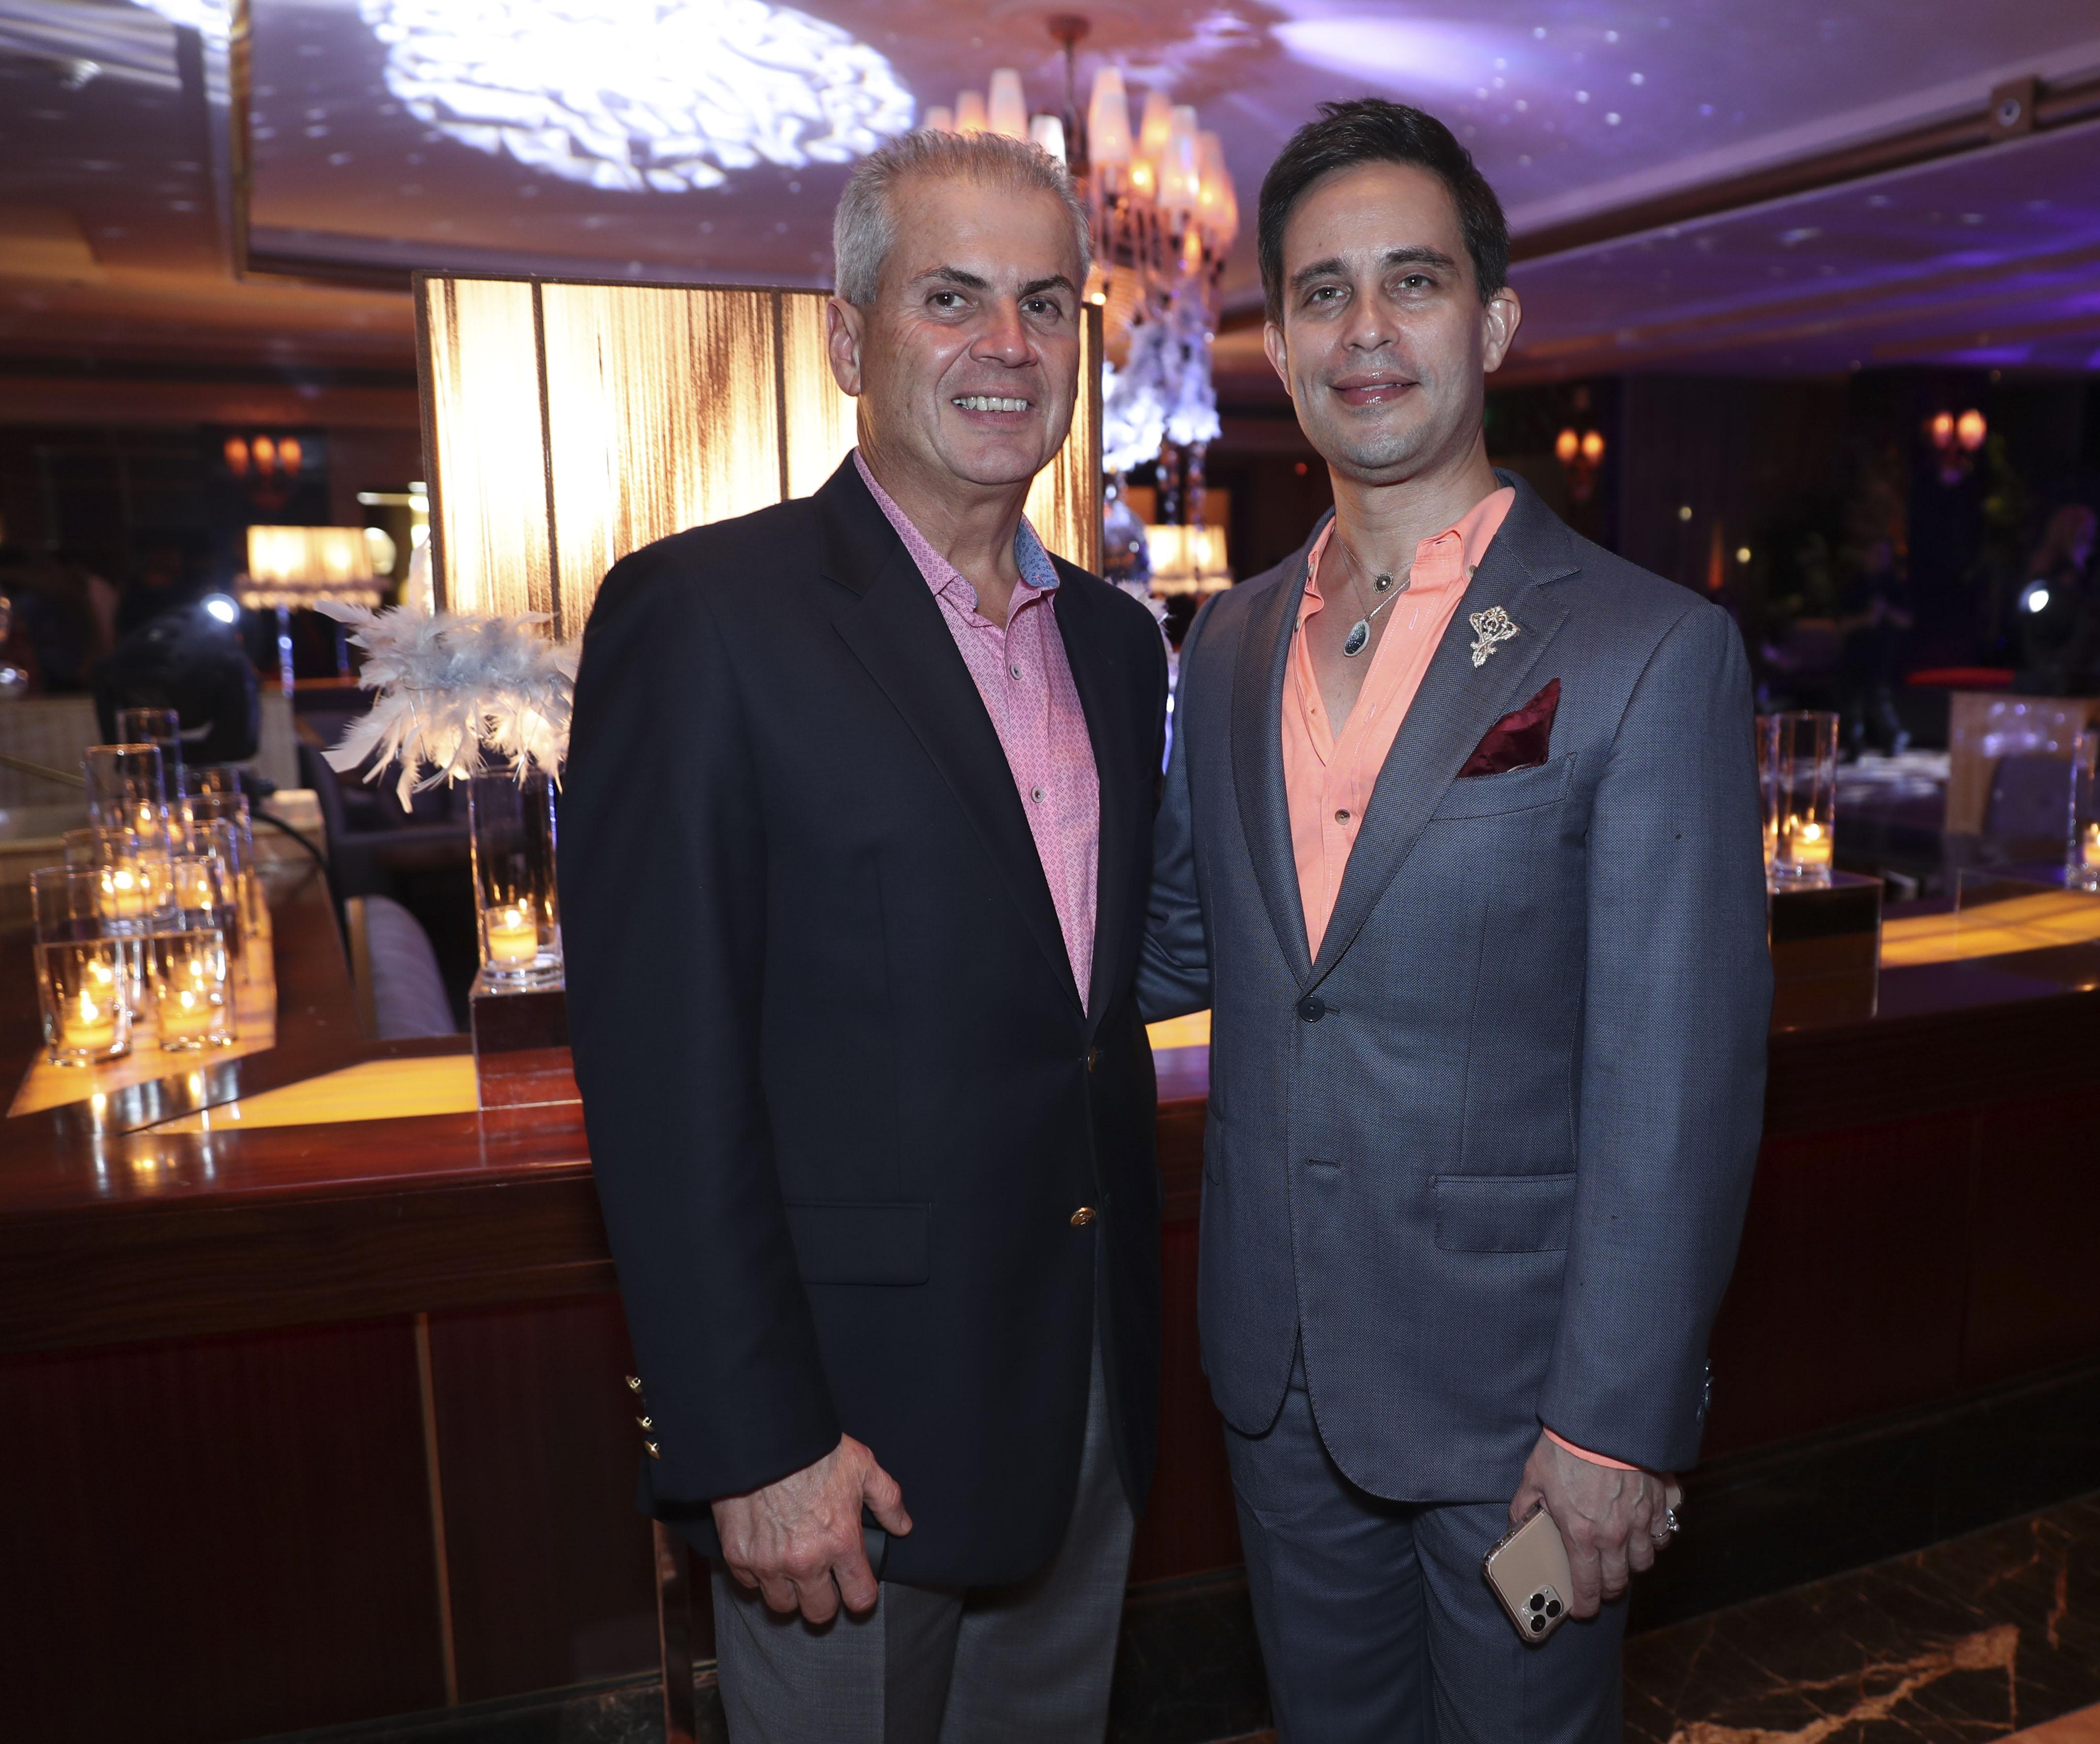 Mike Rivera y Eugenio Latimer. (Suministrada)